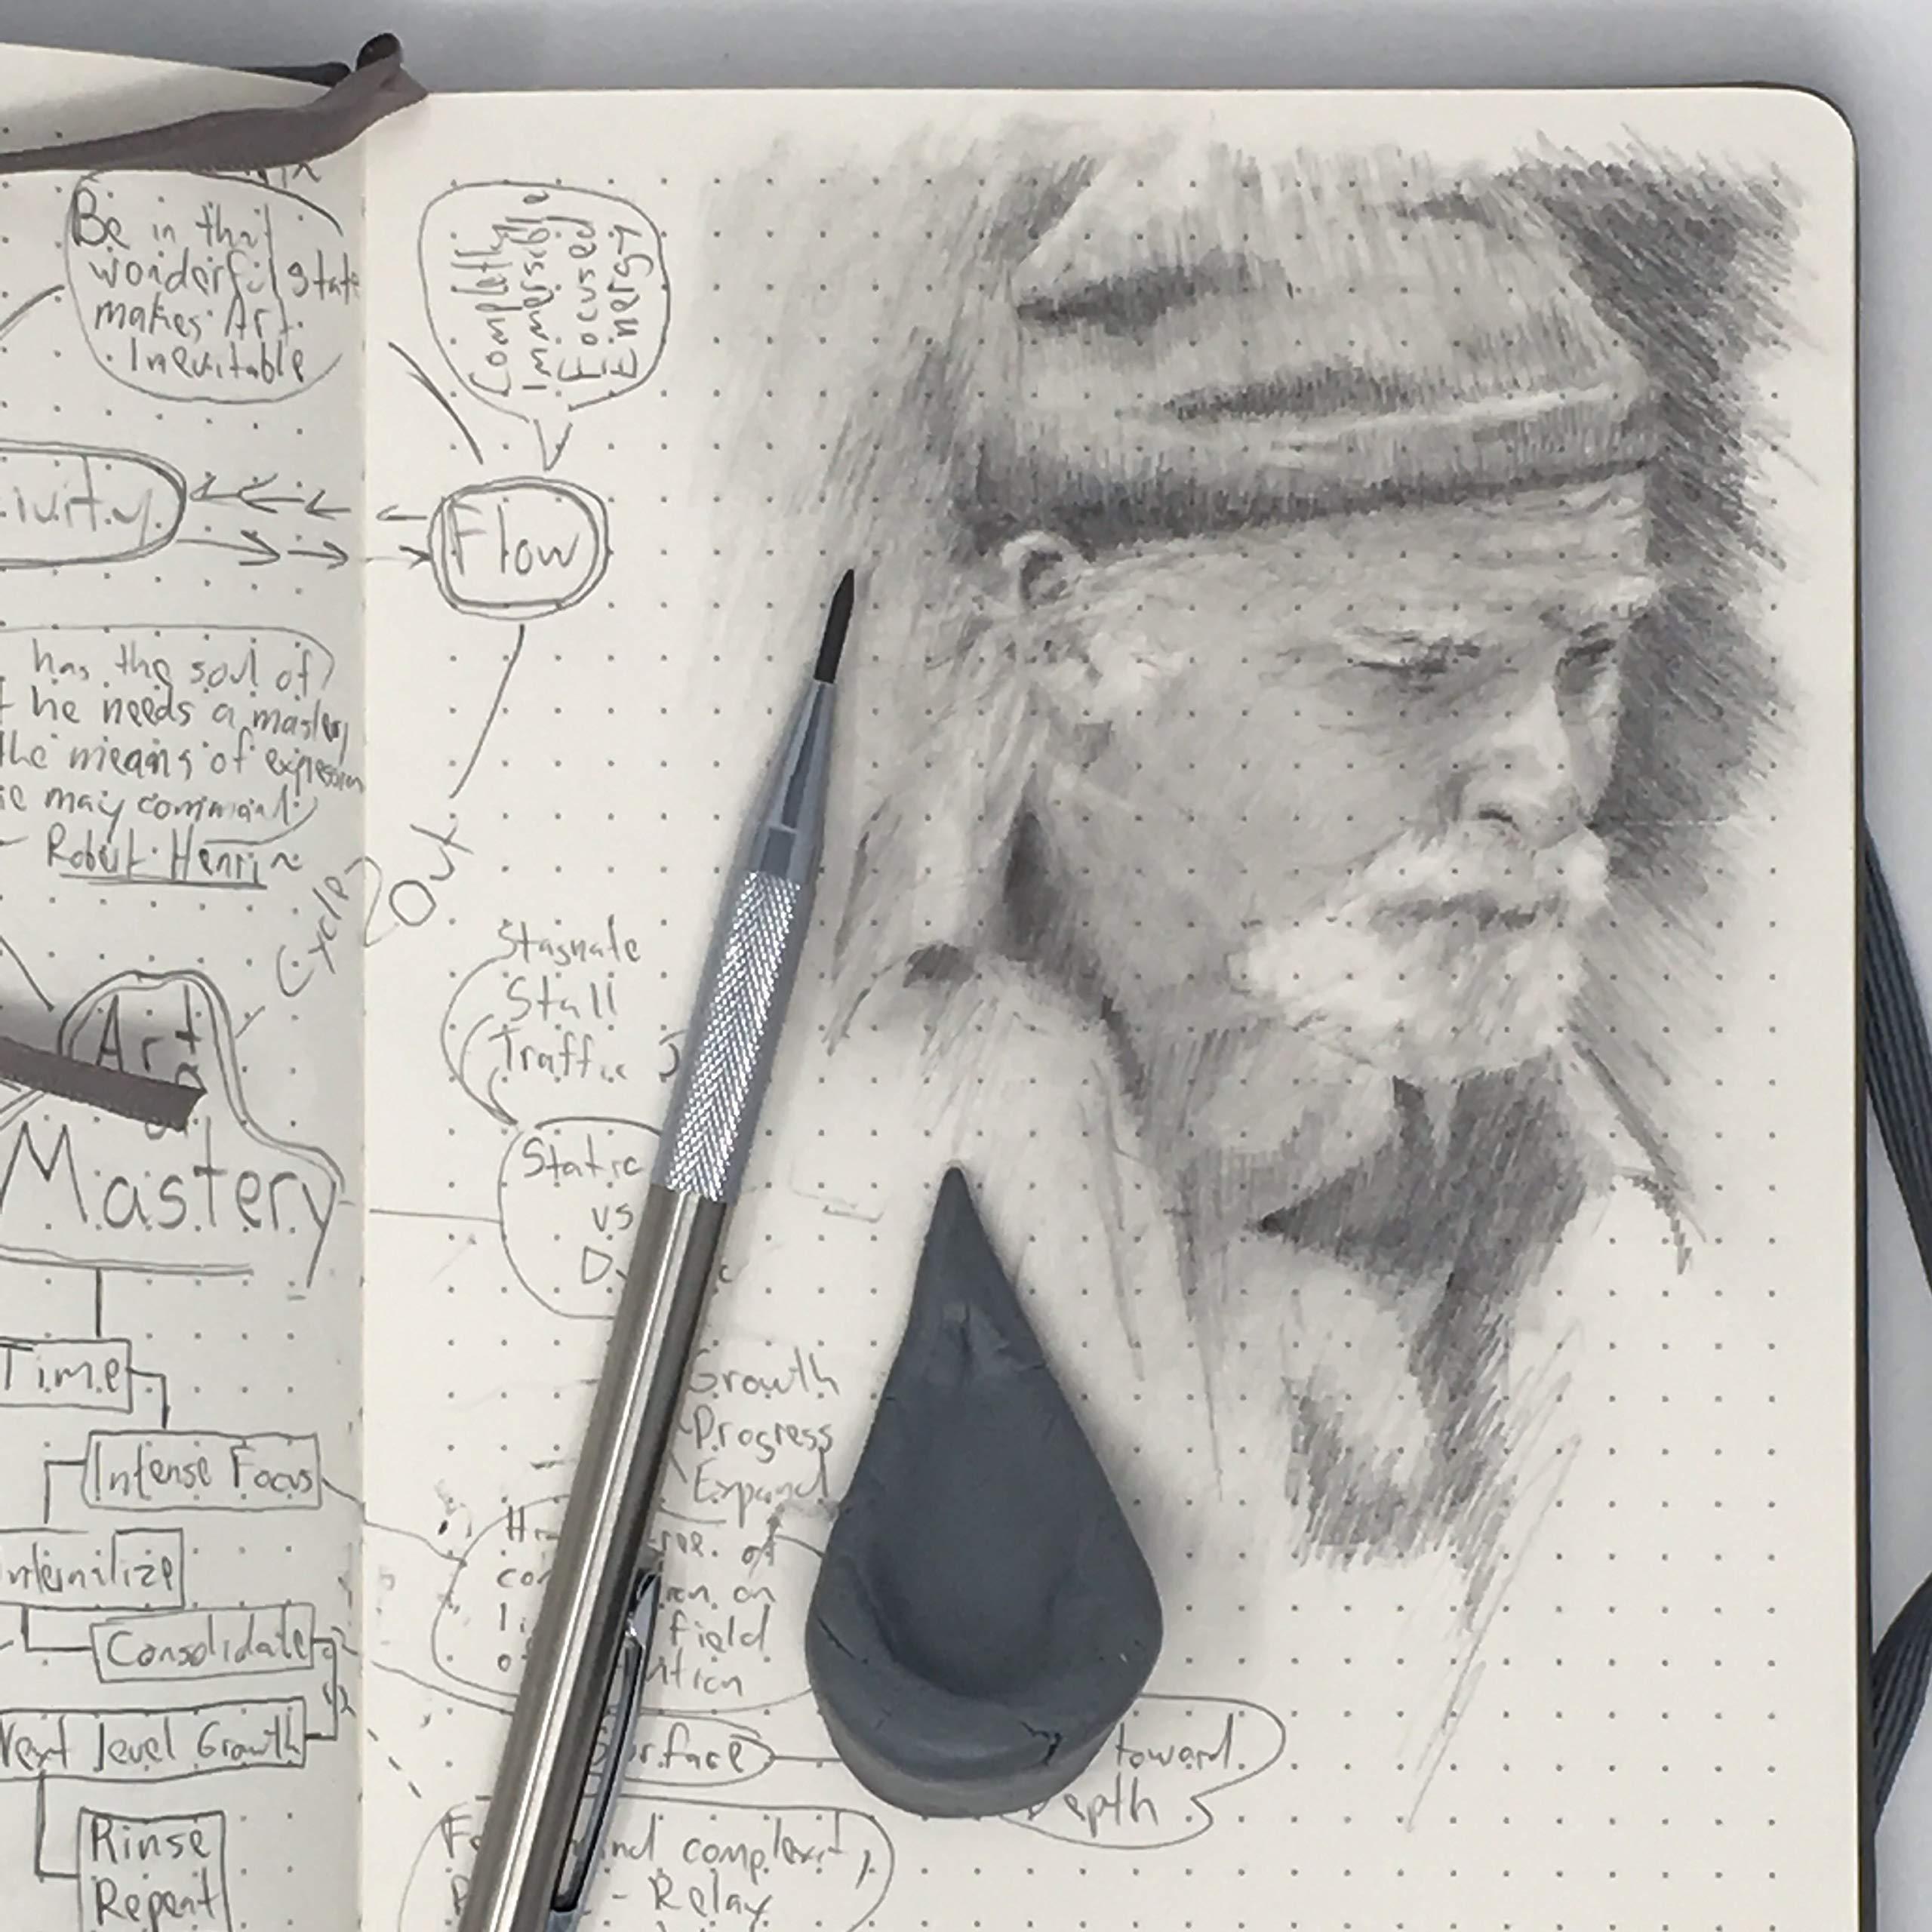 Drawing Mechanical Pencils 9-Piece | Kneaded Eraser | 2 mm Pencil Lead Refills for Artists | Travel Art Set Case | Professional Sketching & Drawing Kit | Metal Pen Barrel by MstrSktch (Image #6)